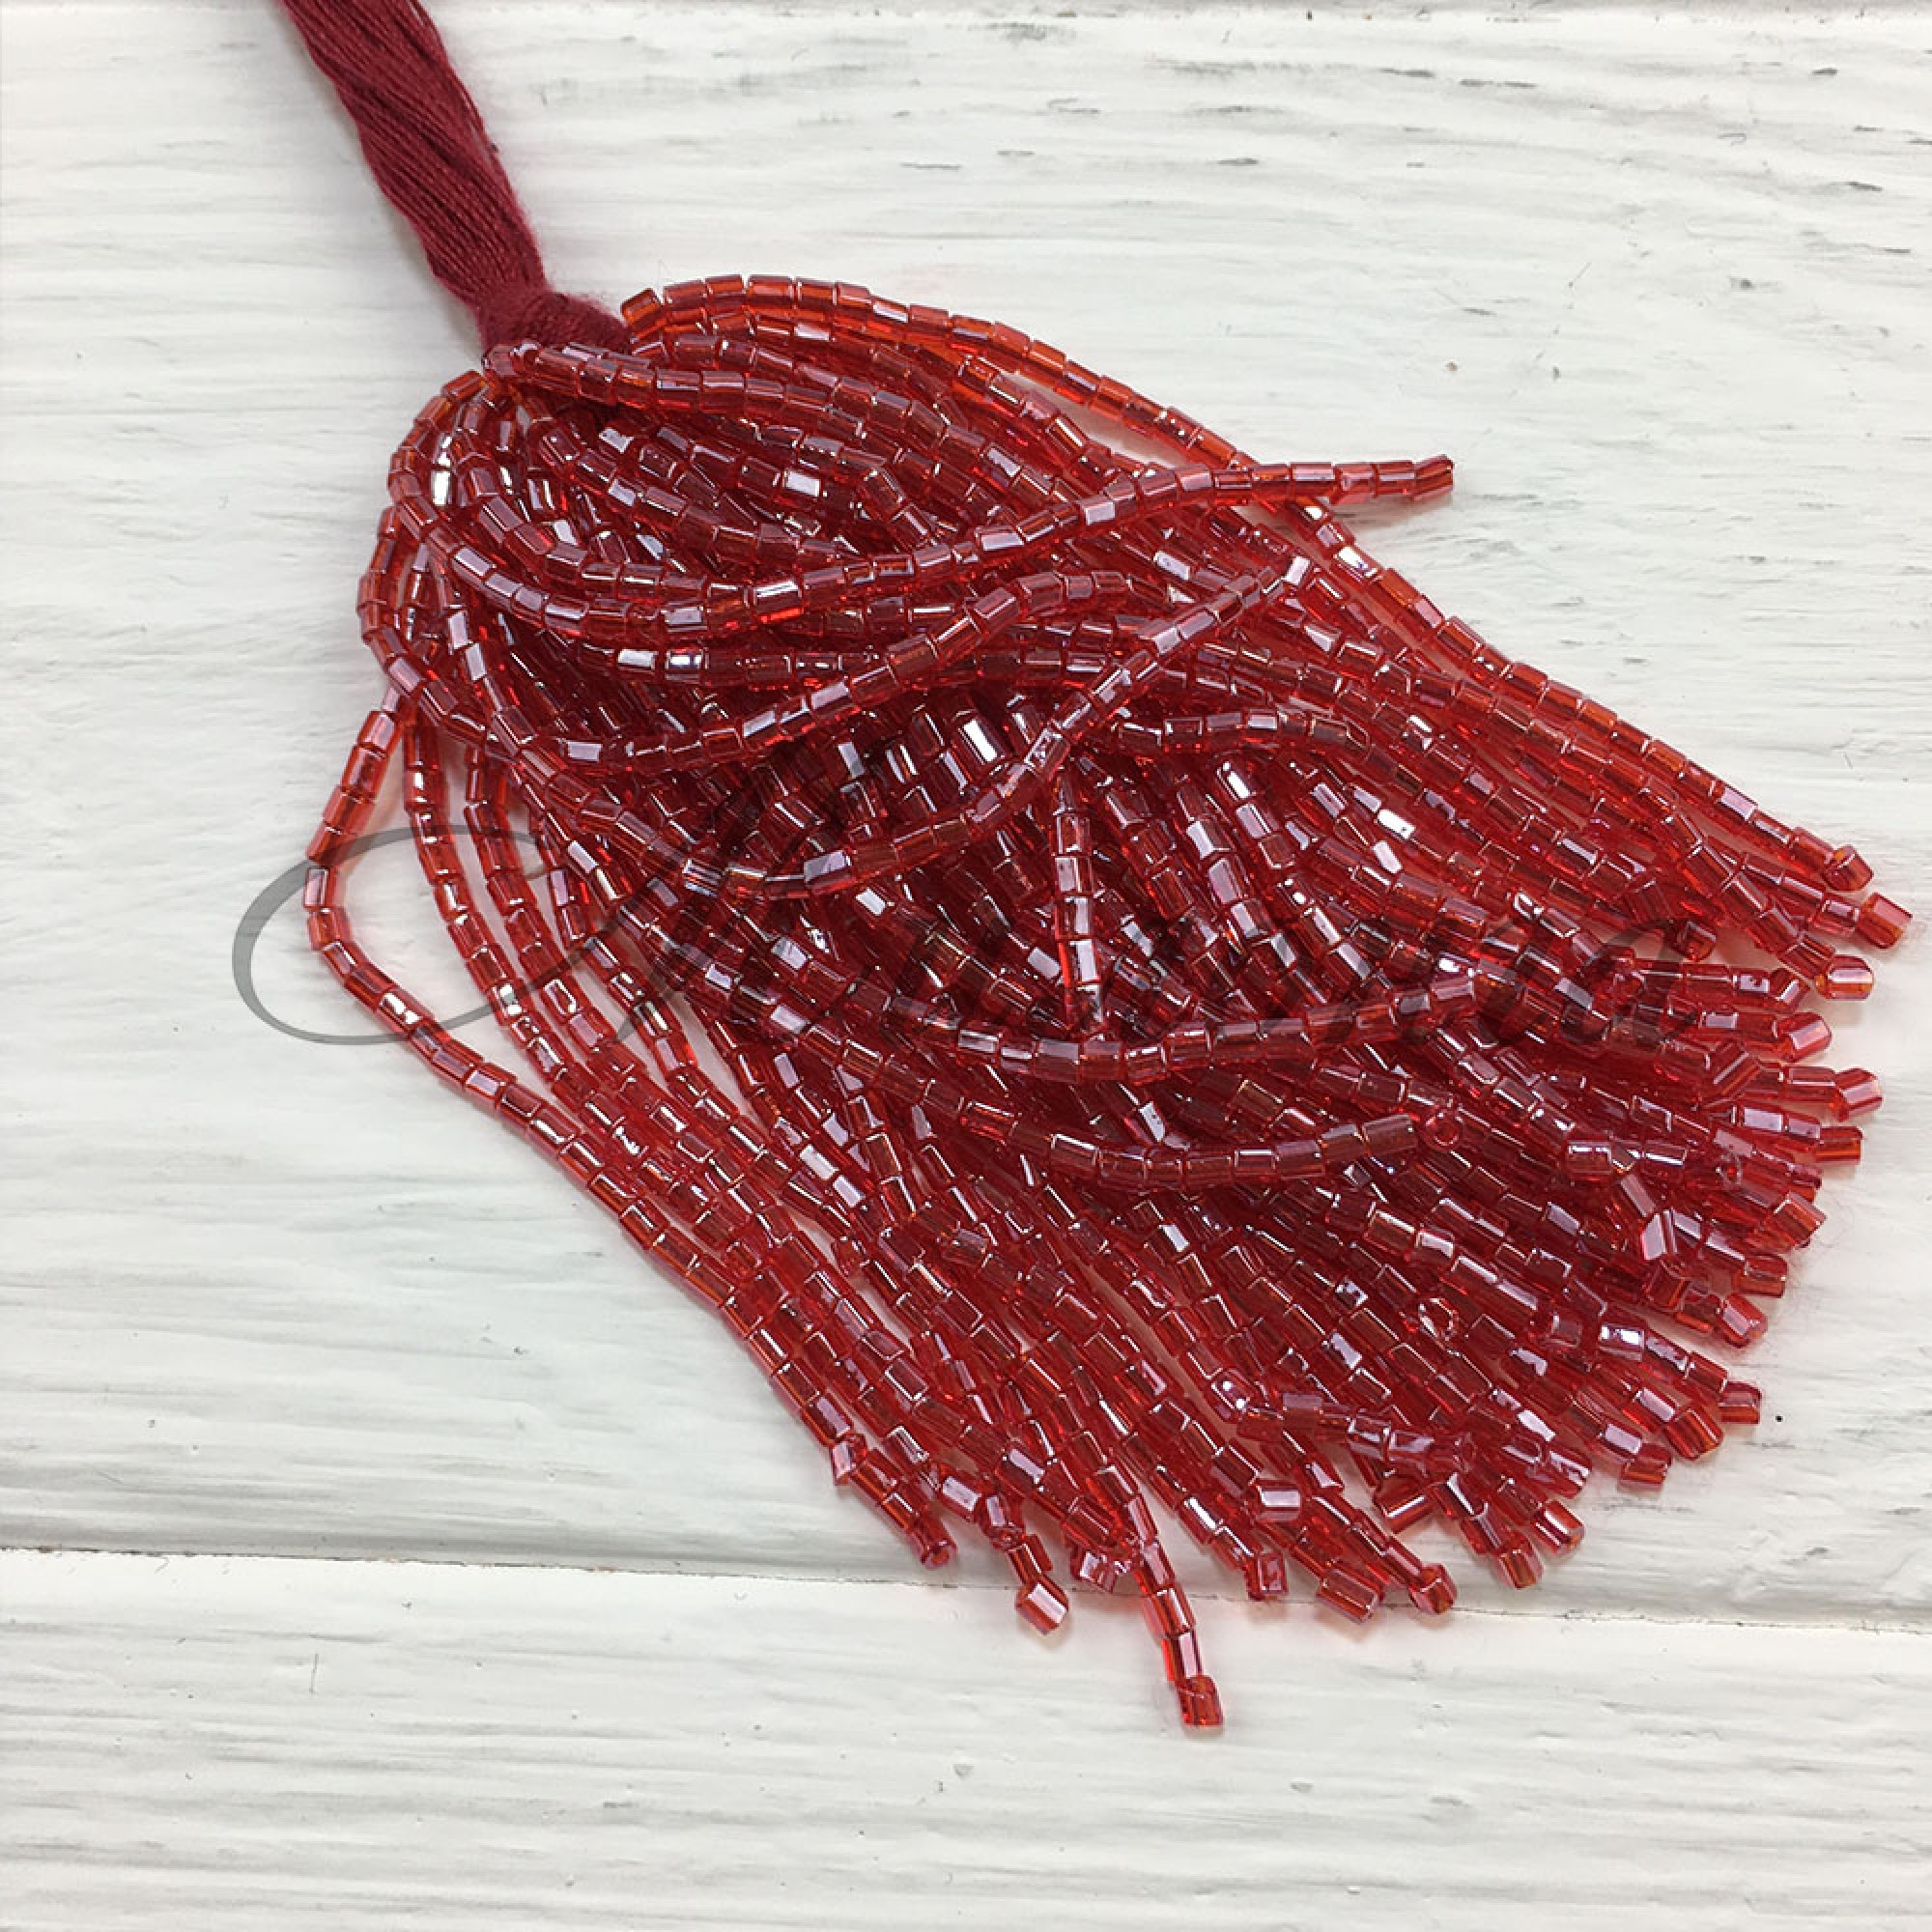 Стеклярус Chrisanne пучок (50 ниток) Red